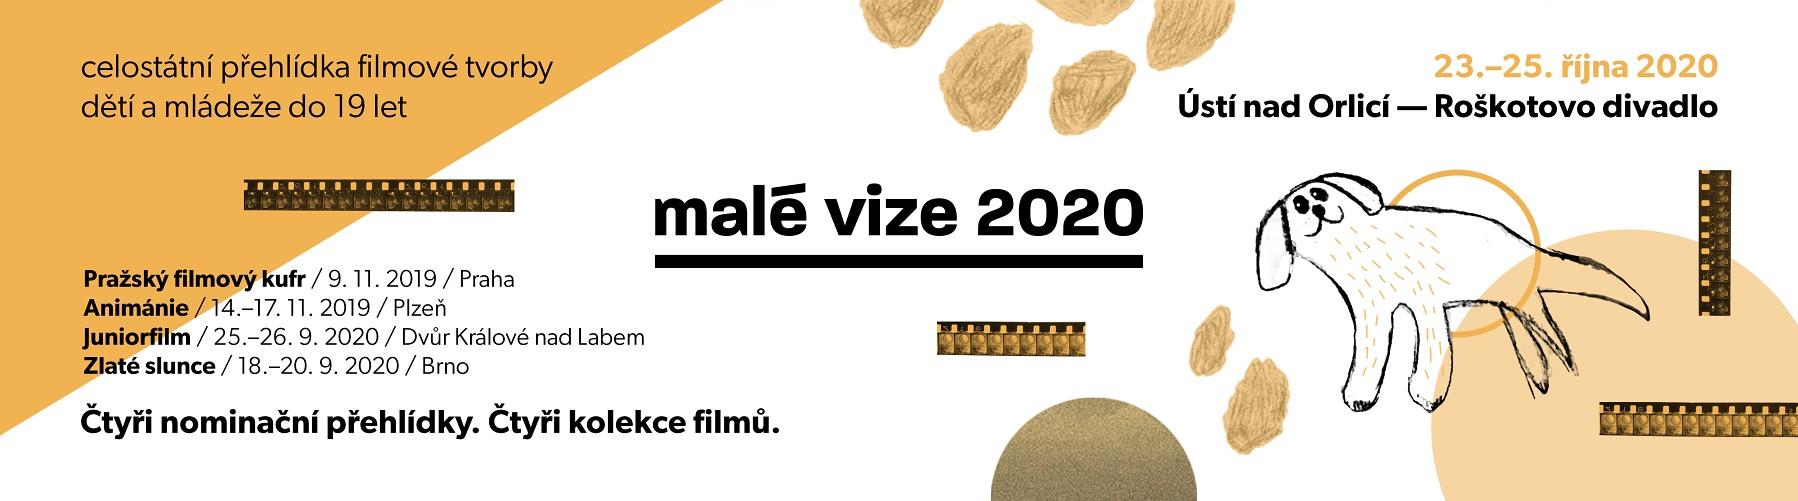 male_vize_2020